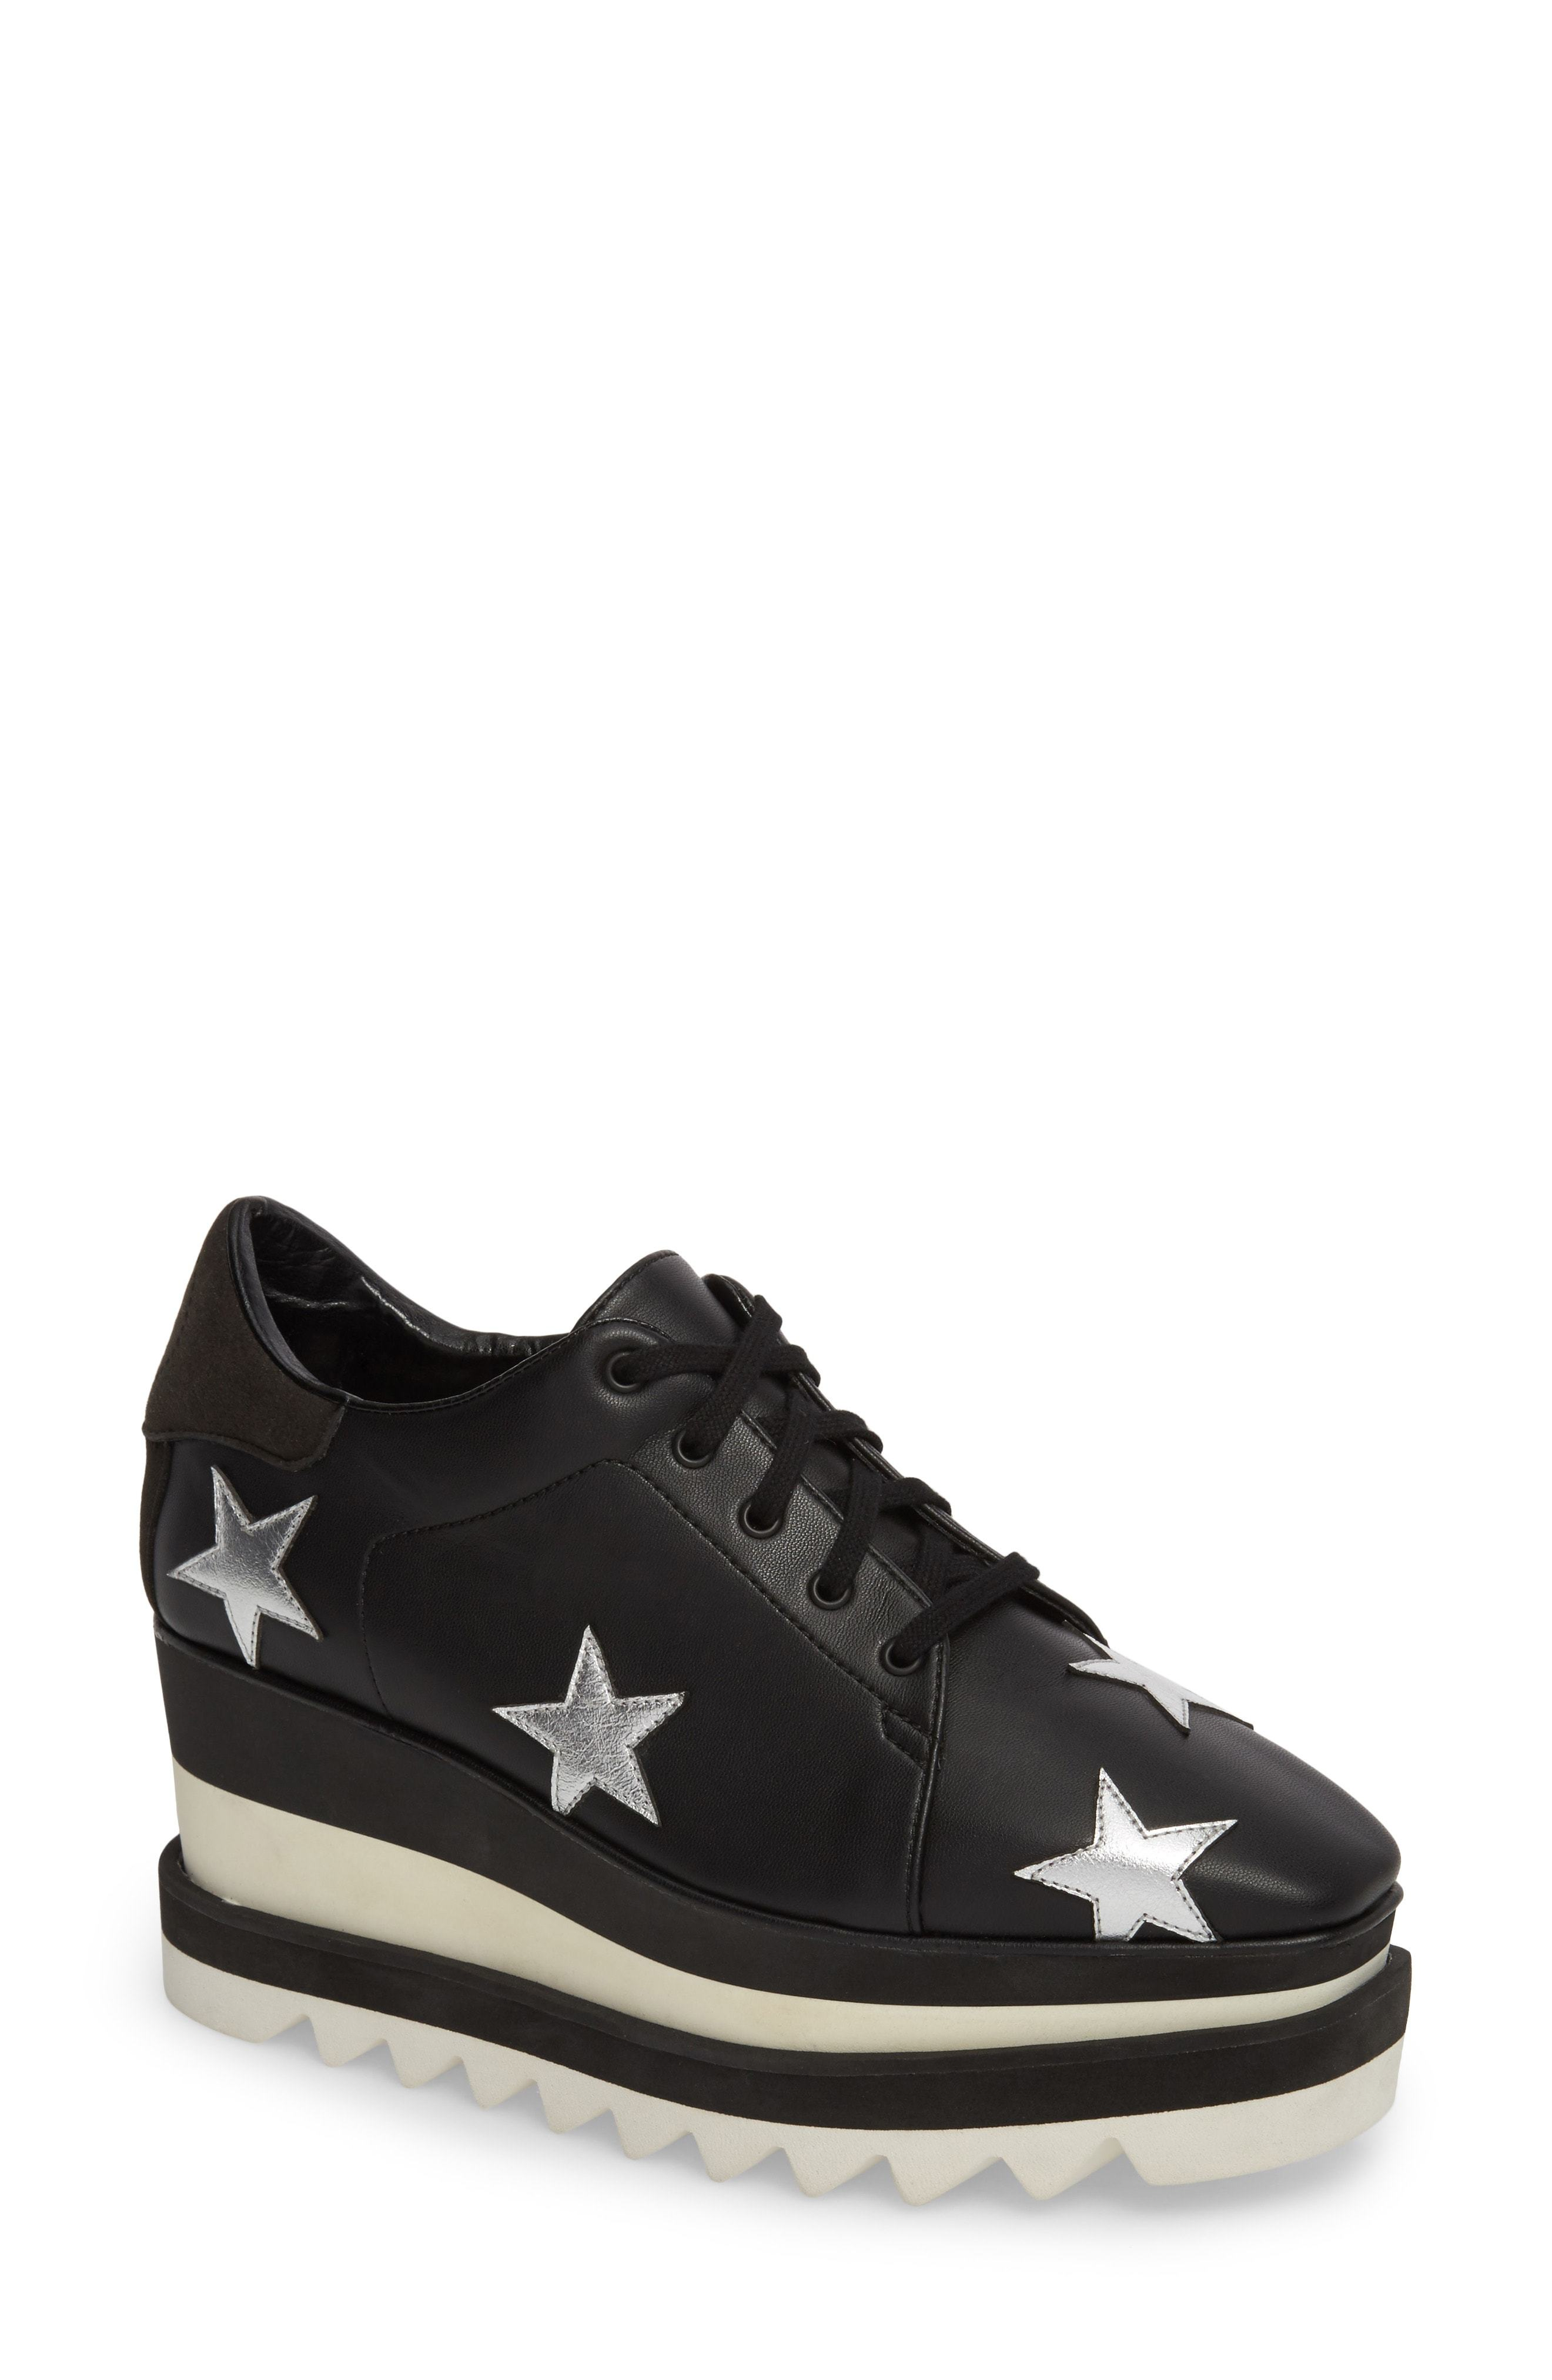 f9754ff078a Elyse Platform Sneaker. Black Chunky Leather Oxford Shoes by Stella  McCartney